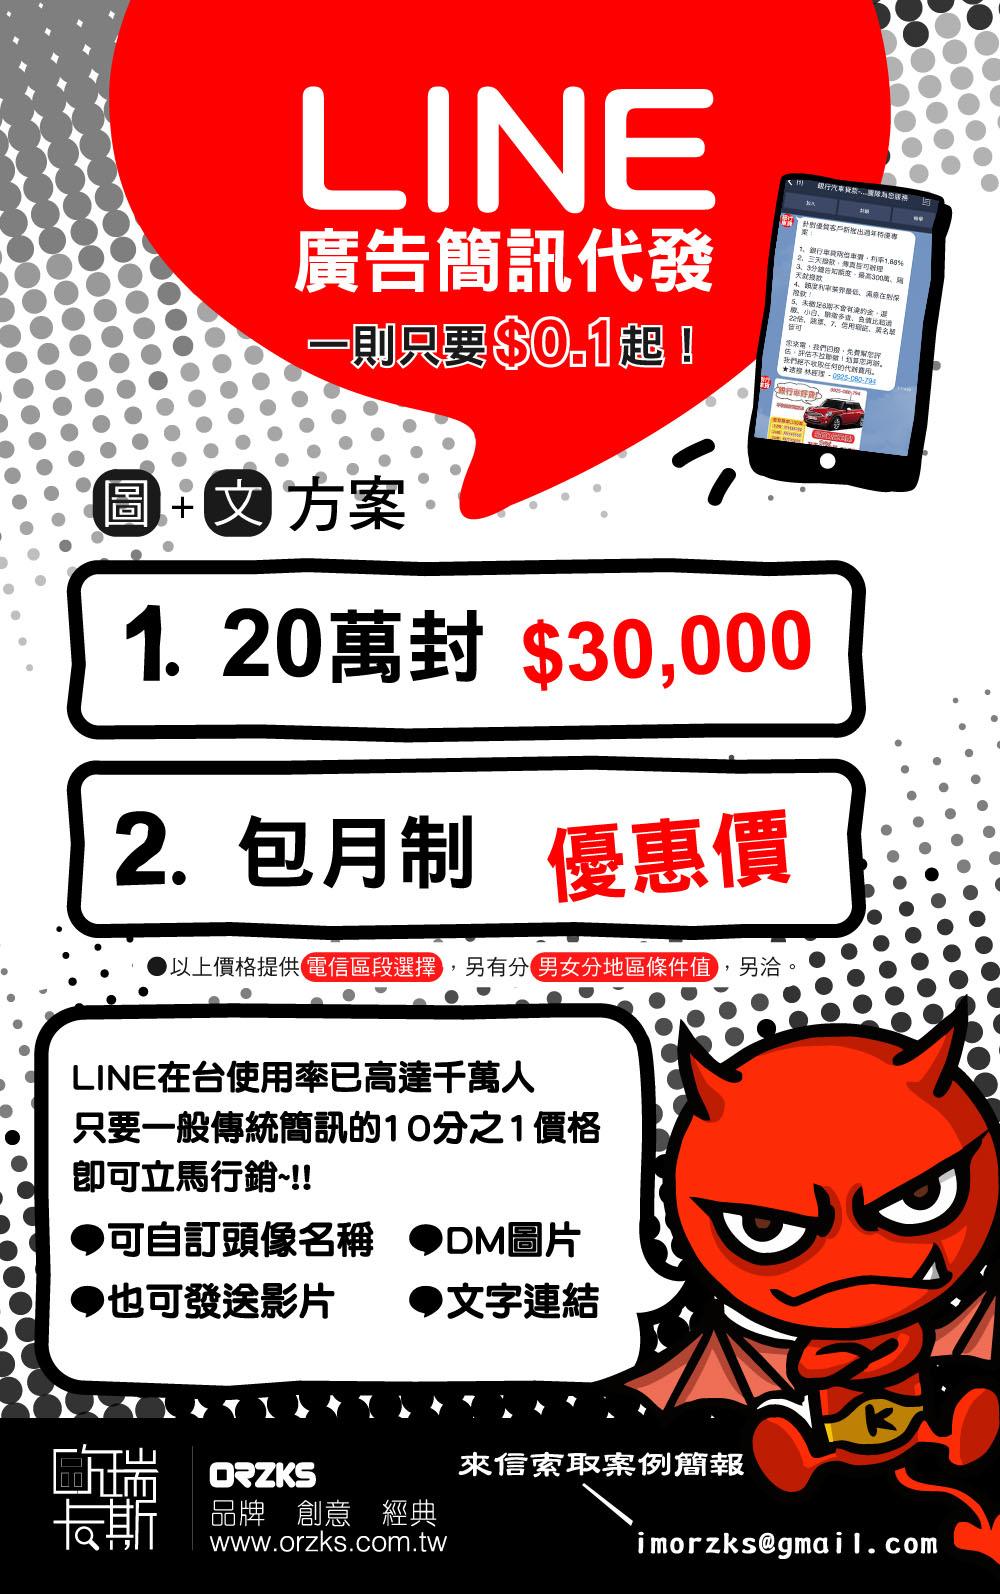 line廣告代發歐瑞卡斯edm0605